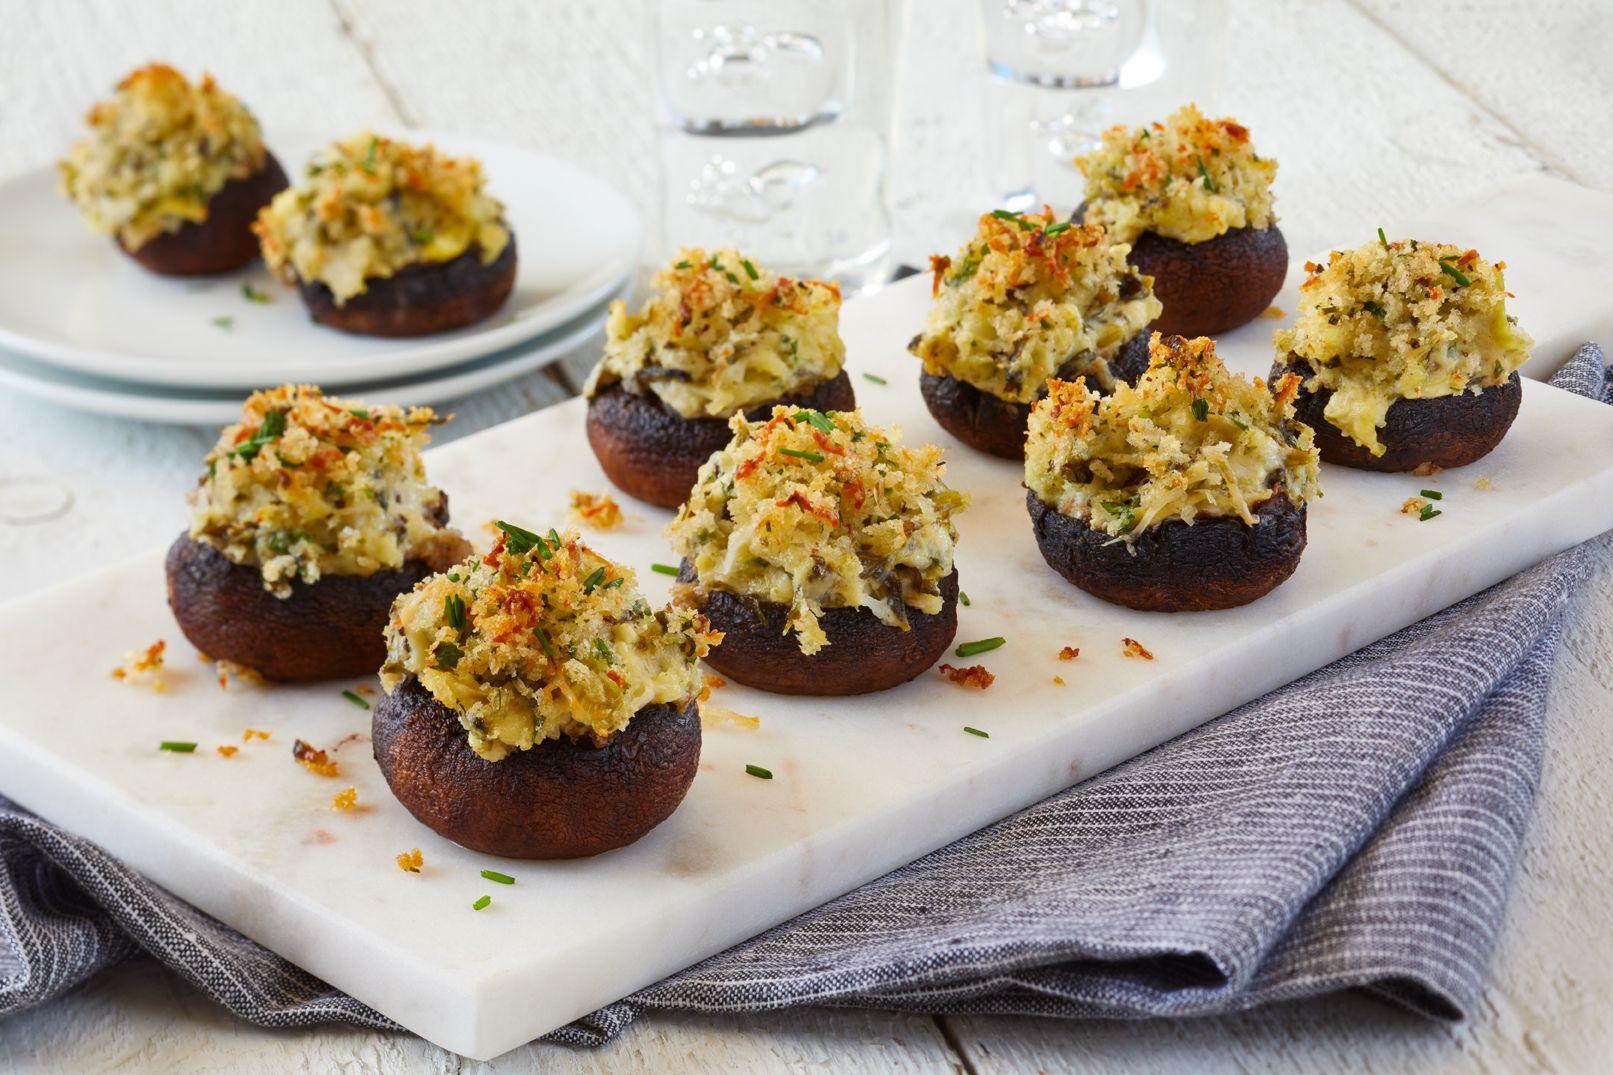 Easy Elegant Stuffed Mushrooms In 2021 Jerf Recipes Recipes Appetizer Recipes Artichoke parmesan stuffed mushrooms